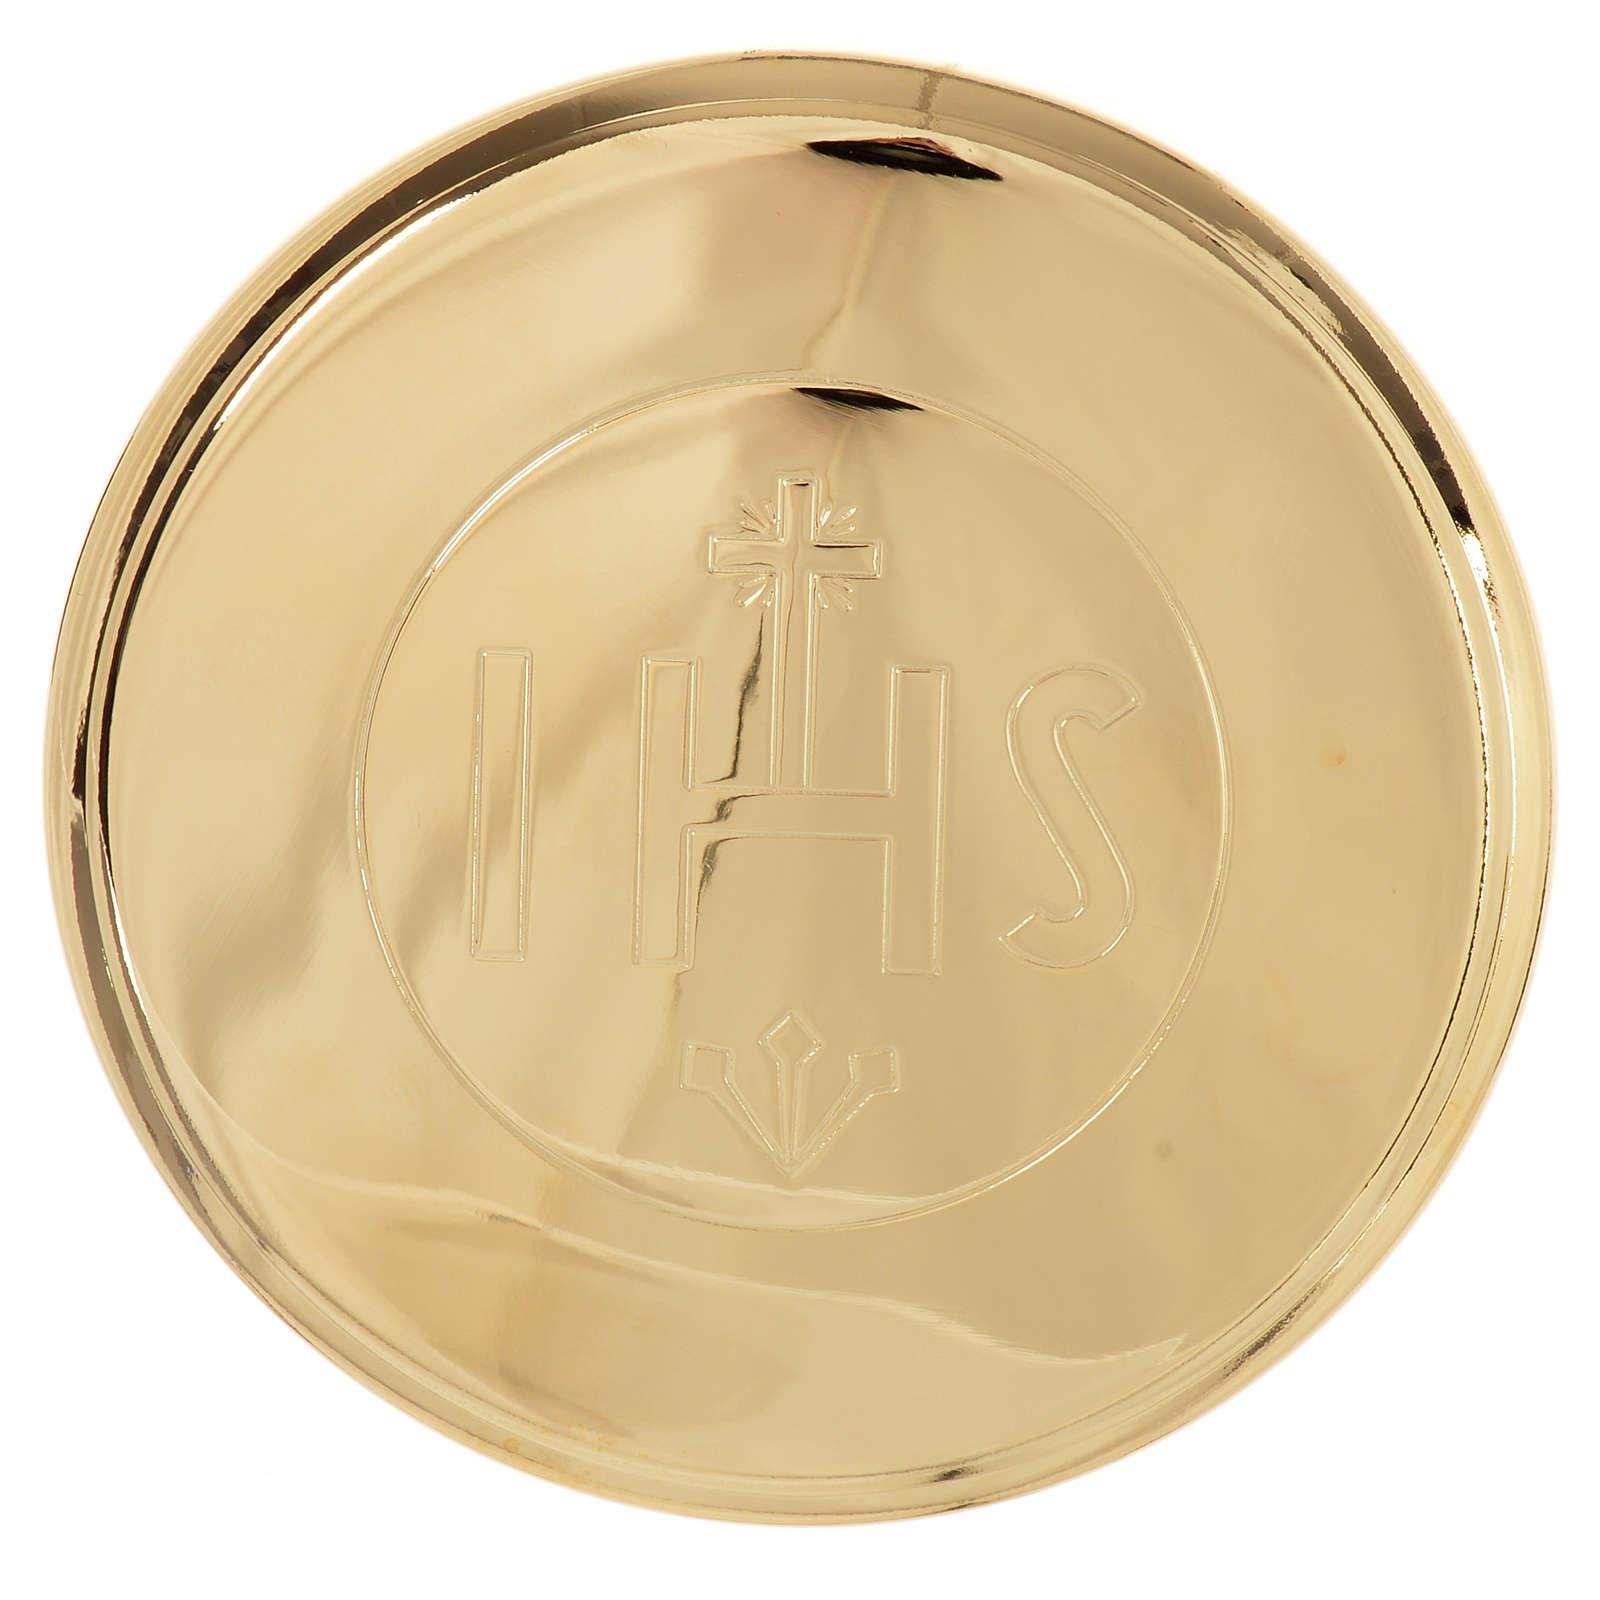 Golden brass pyx with IHS engraving, 7cm diameter 3